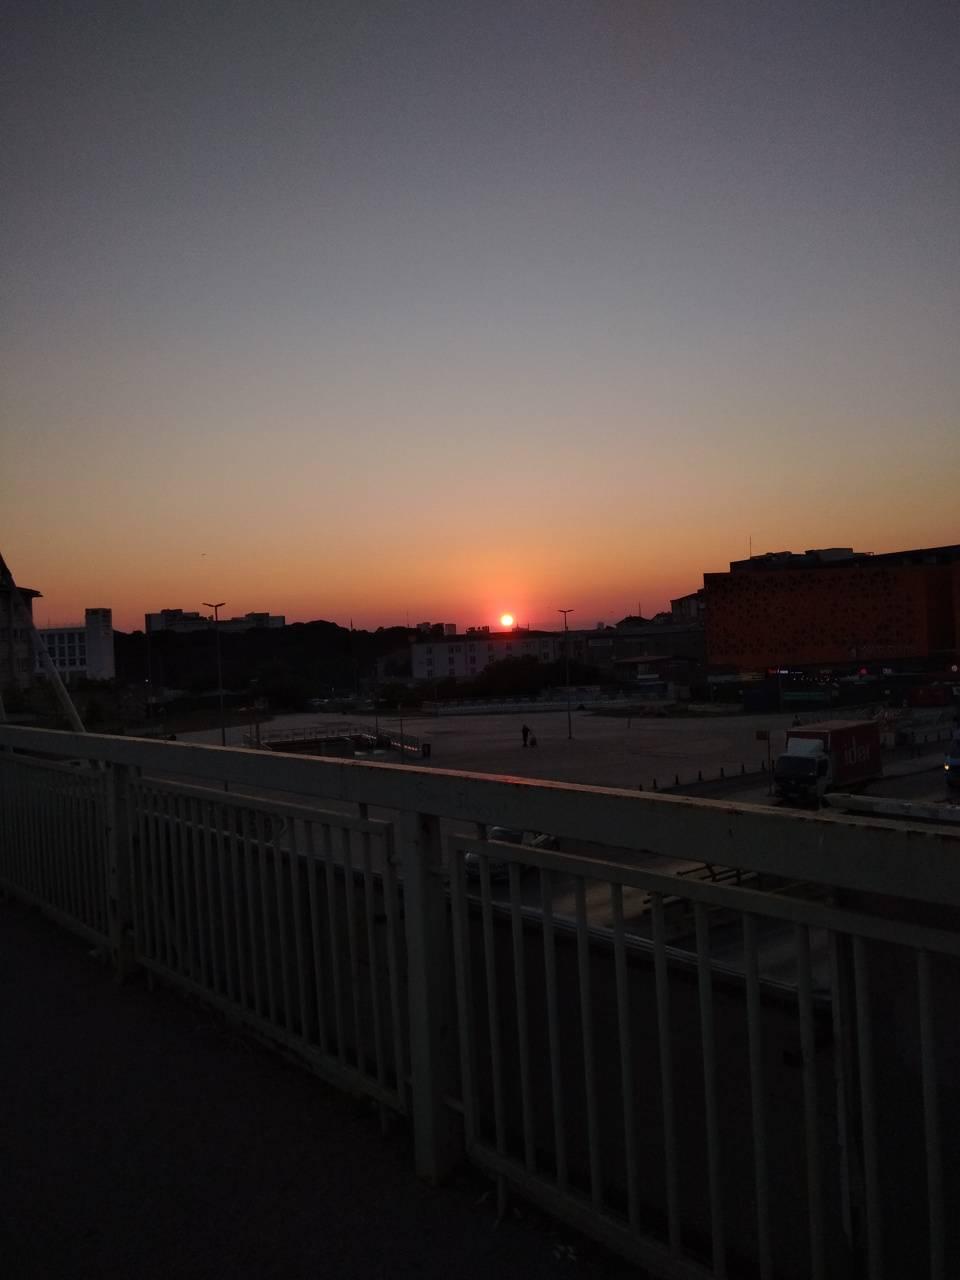 Gun batimi sunset